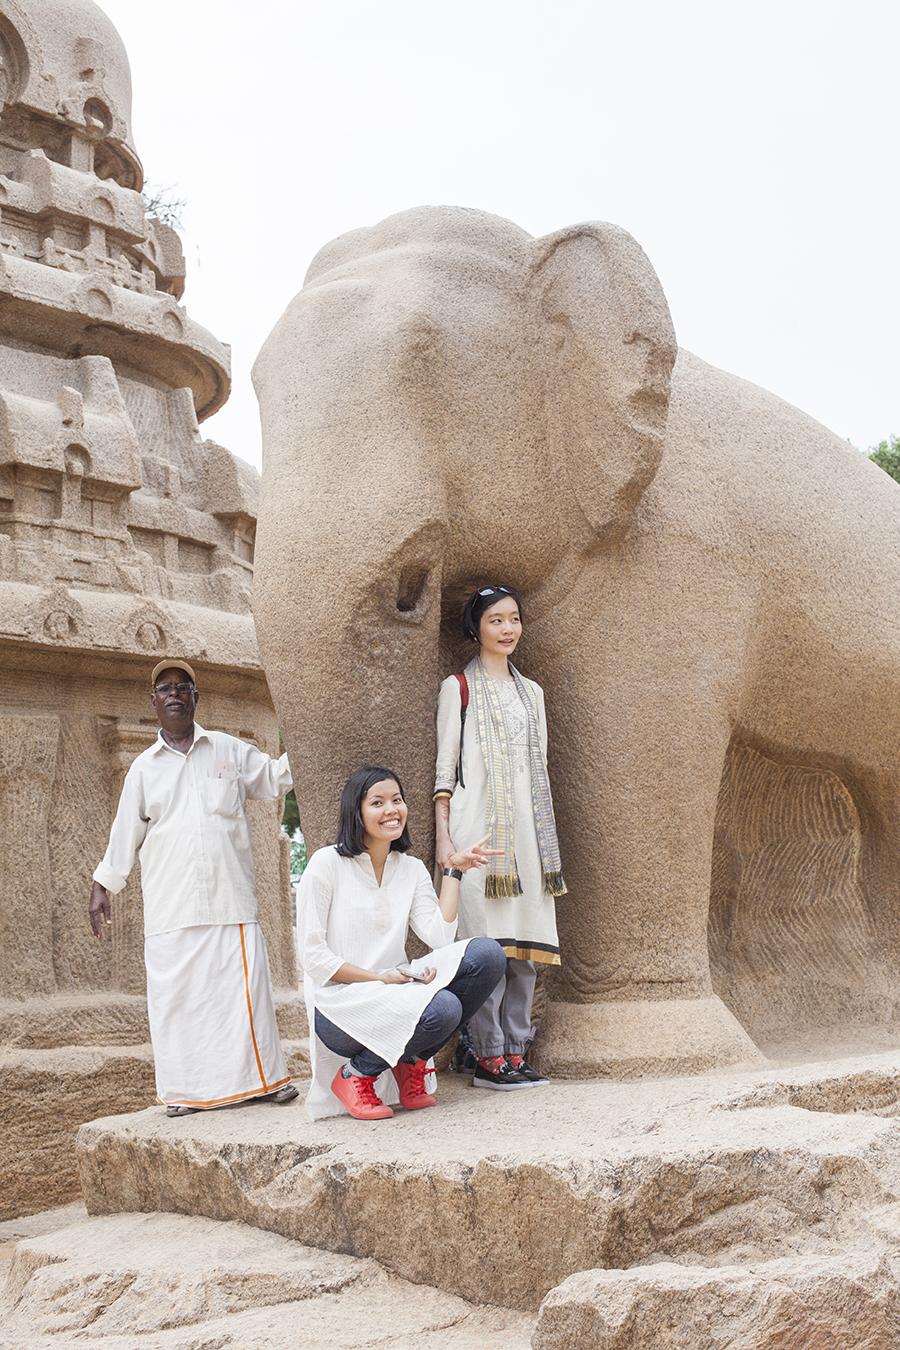 Photo of Shasha, Ren, and tour guide at the 5 Rathas, Mahabalipuram Chennai India.